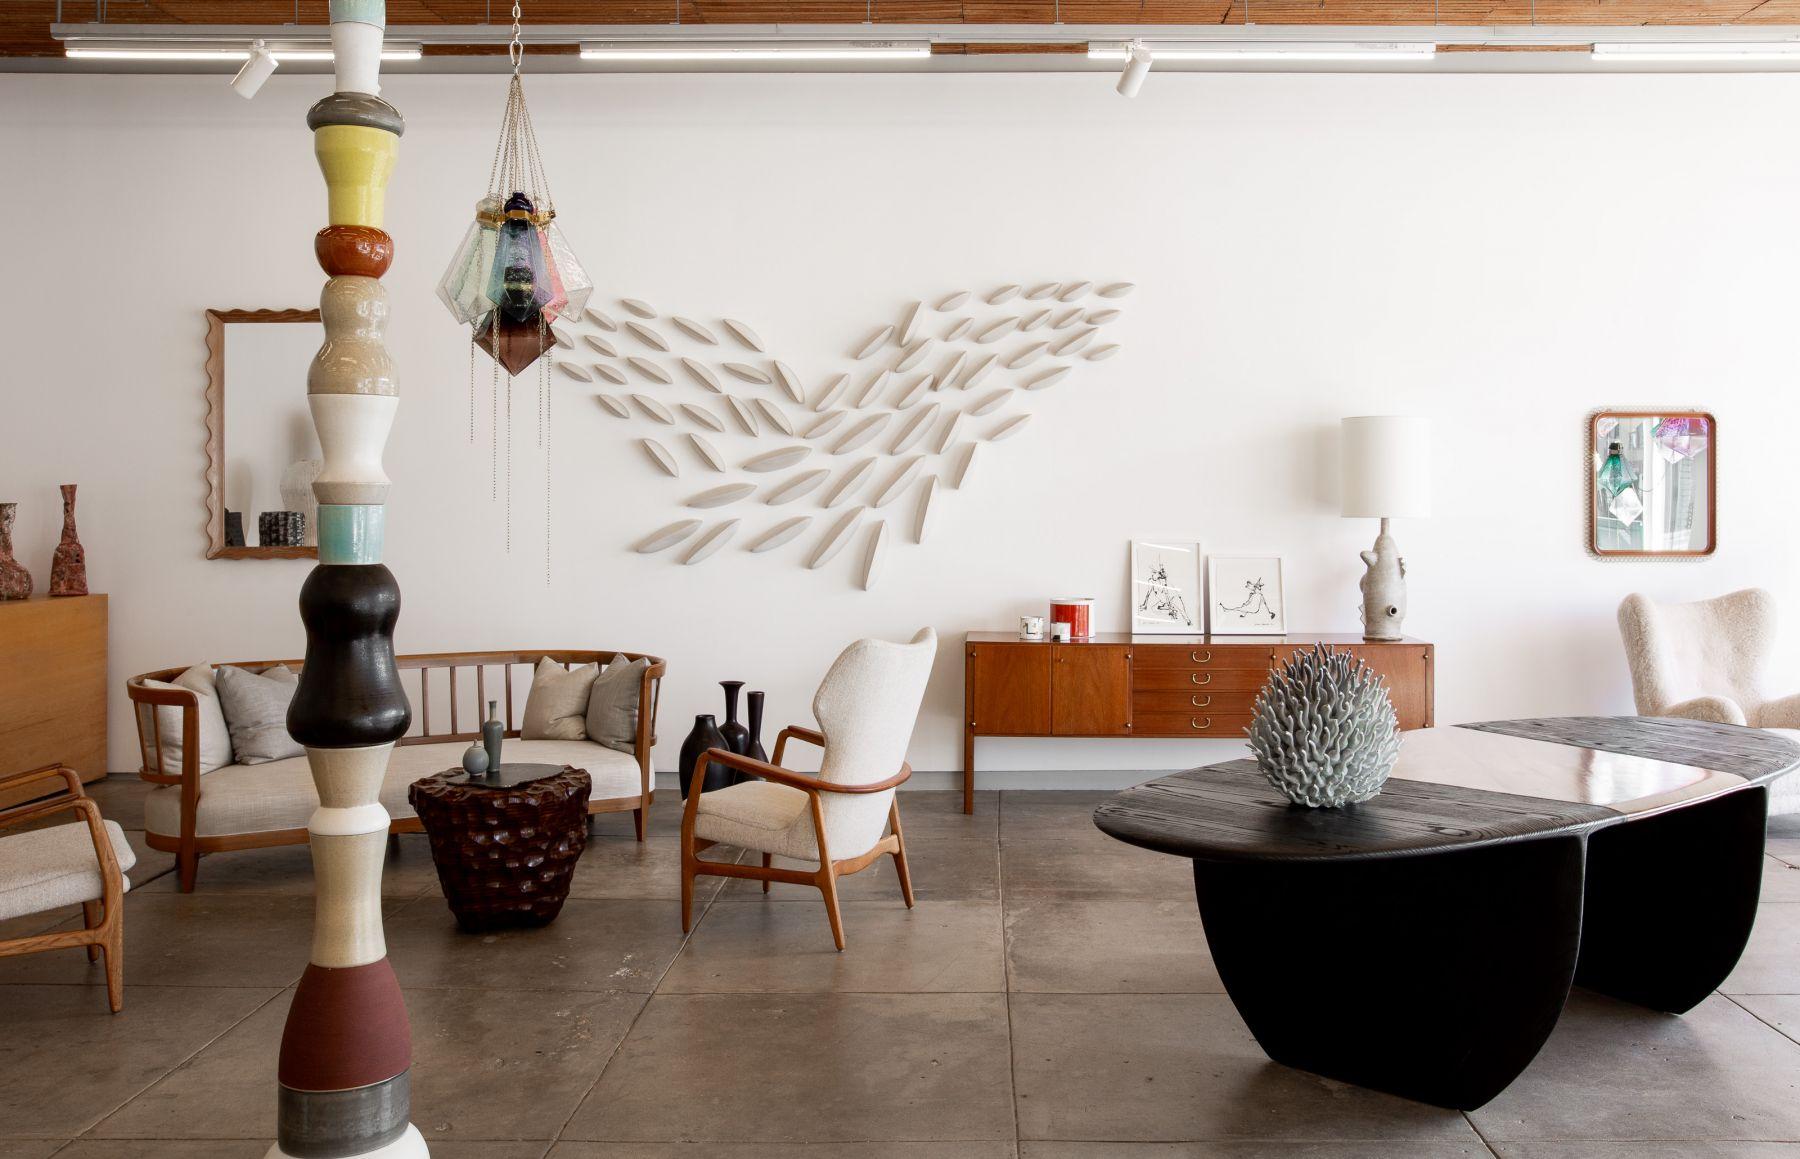 Nicola Tassie Folly Totem at Hostler Burrows Los Angeles